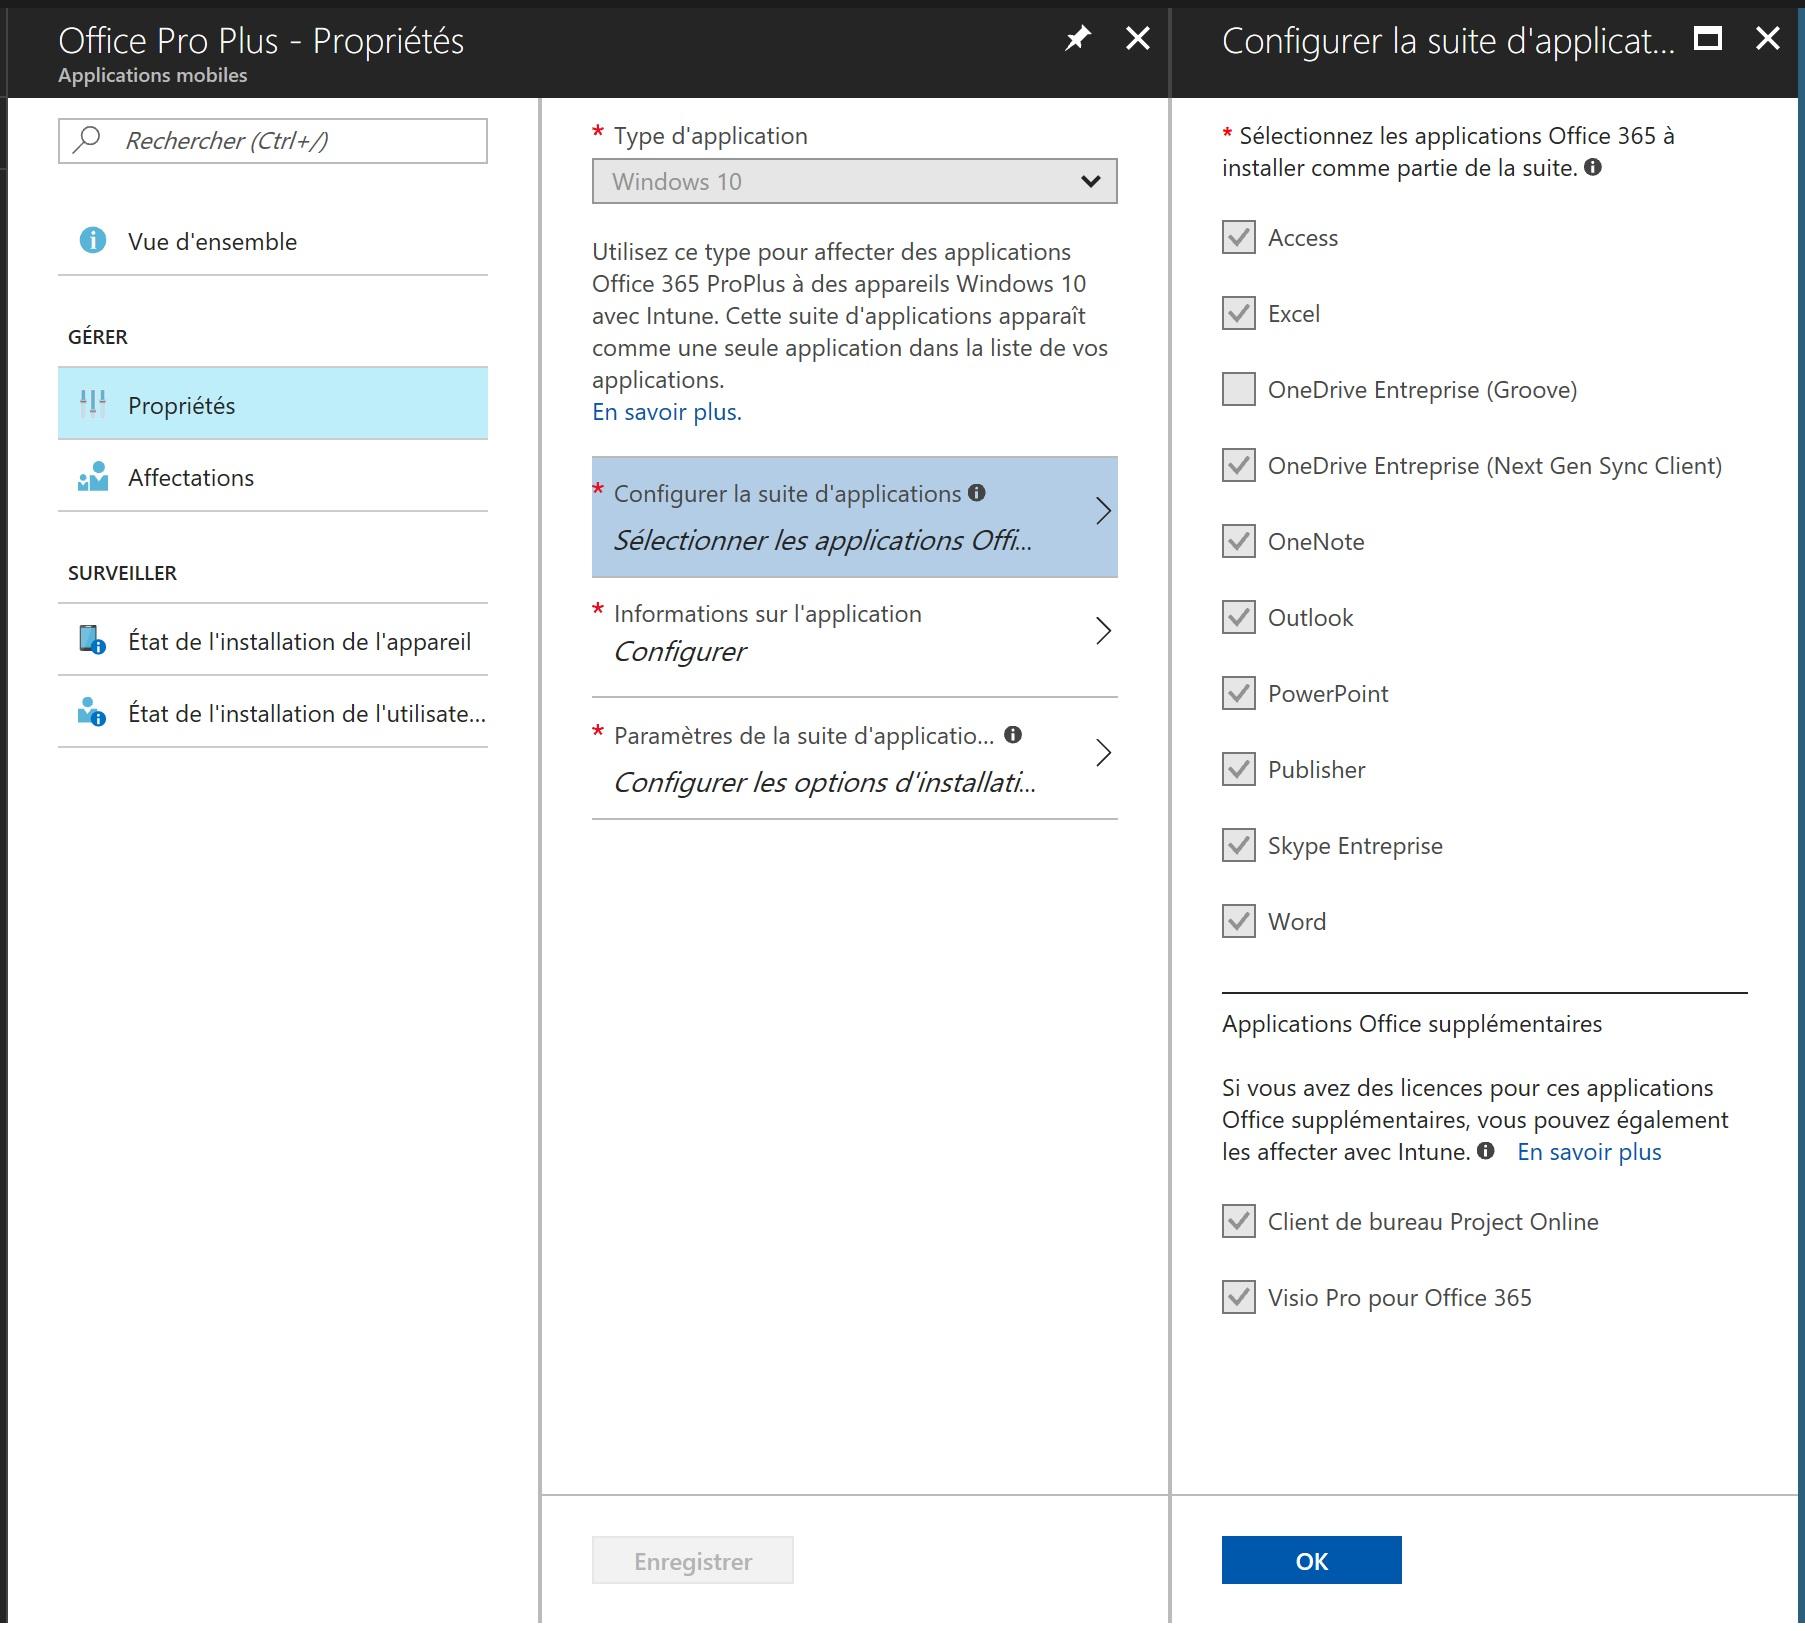 Office Pro Plus install via Intune fails (0x10)